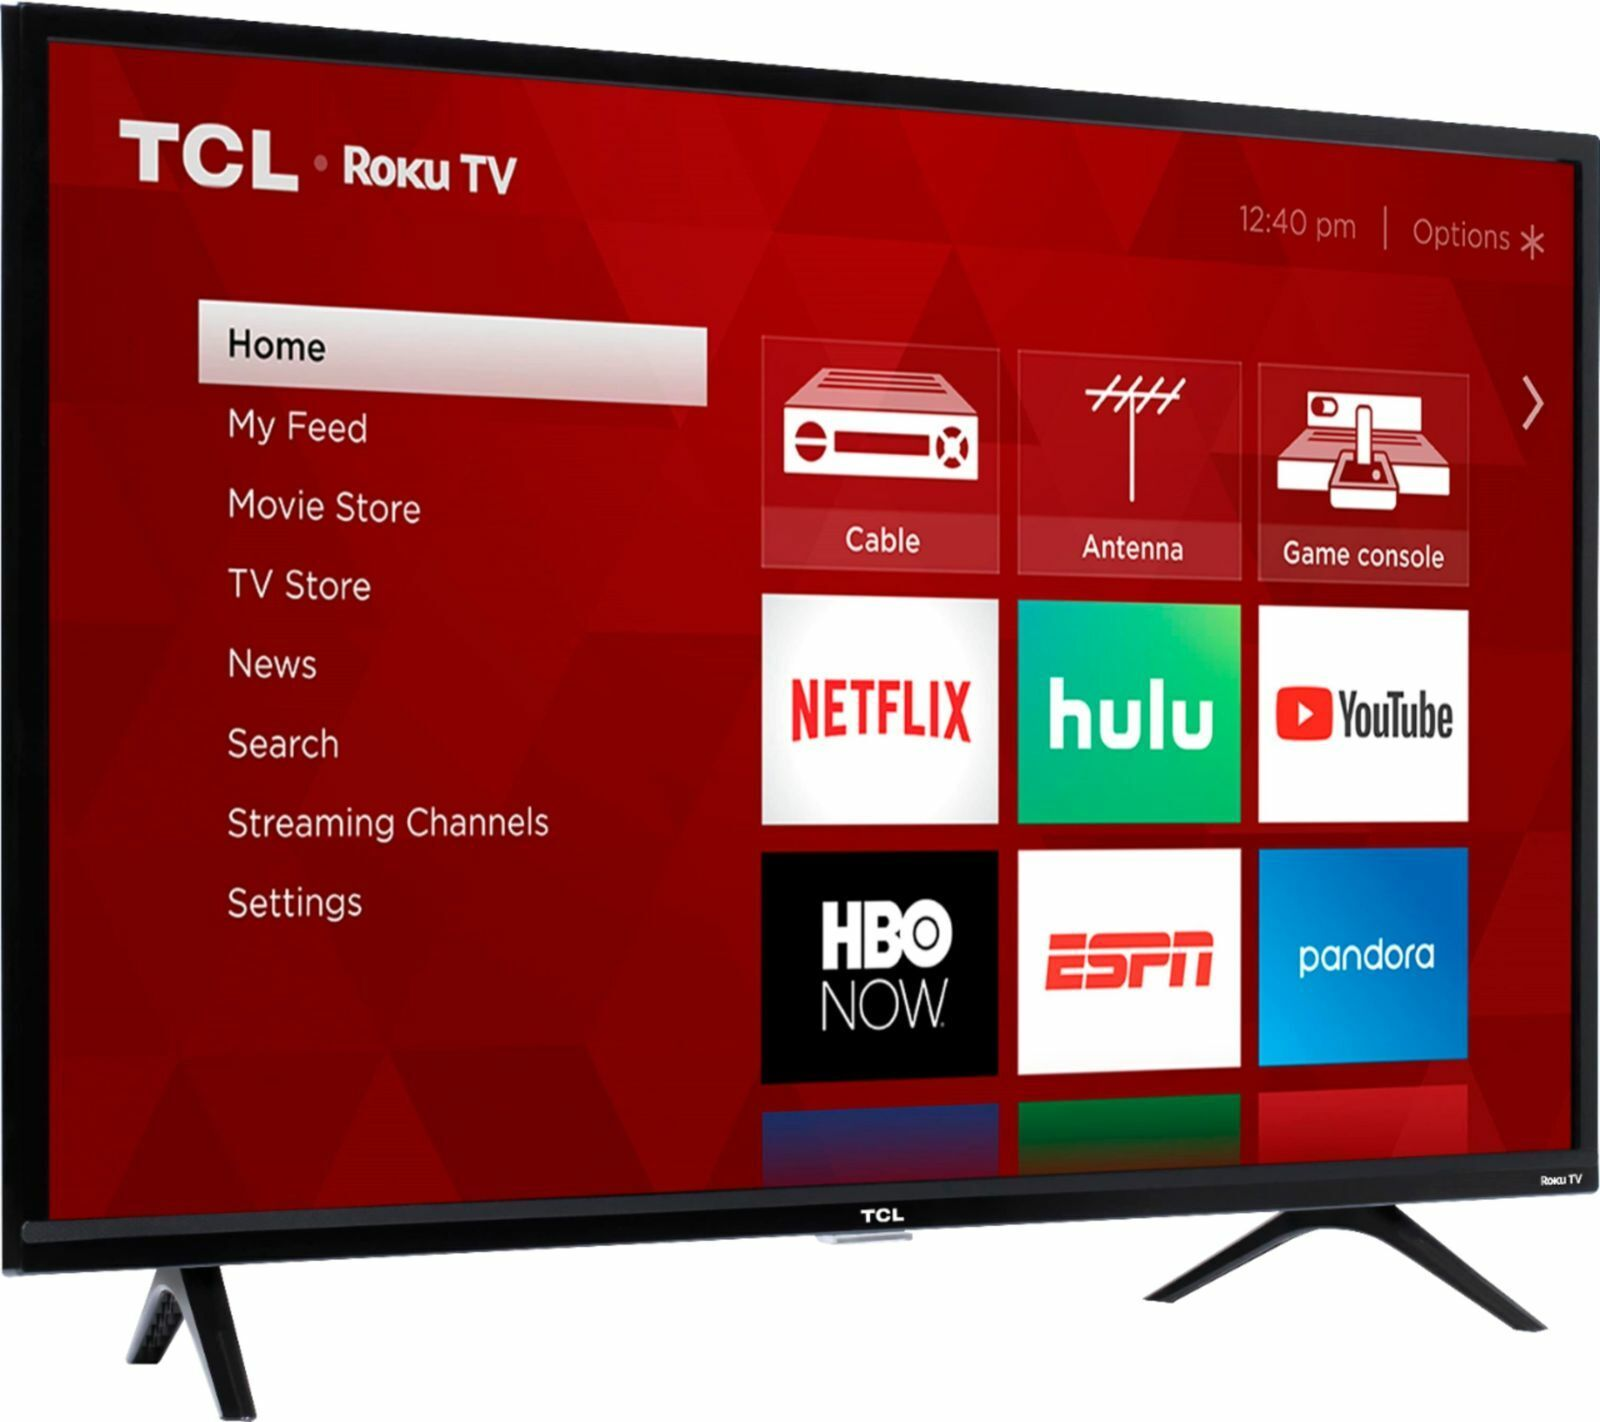 TCL 40 inch 1080p Class 3 Series LED Smart HDTV Roku TV Free